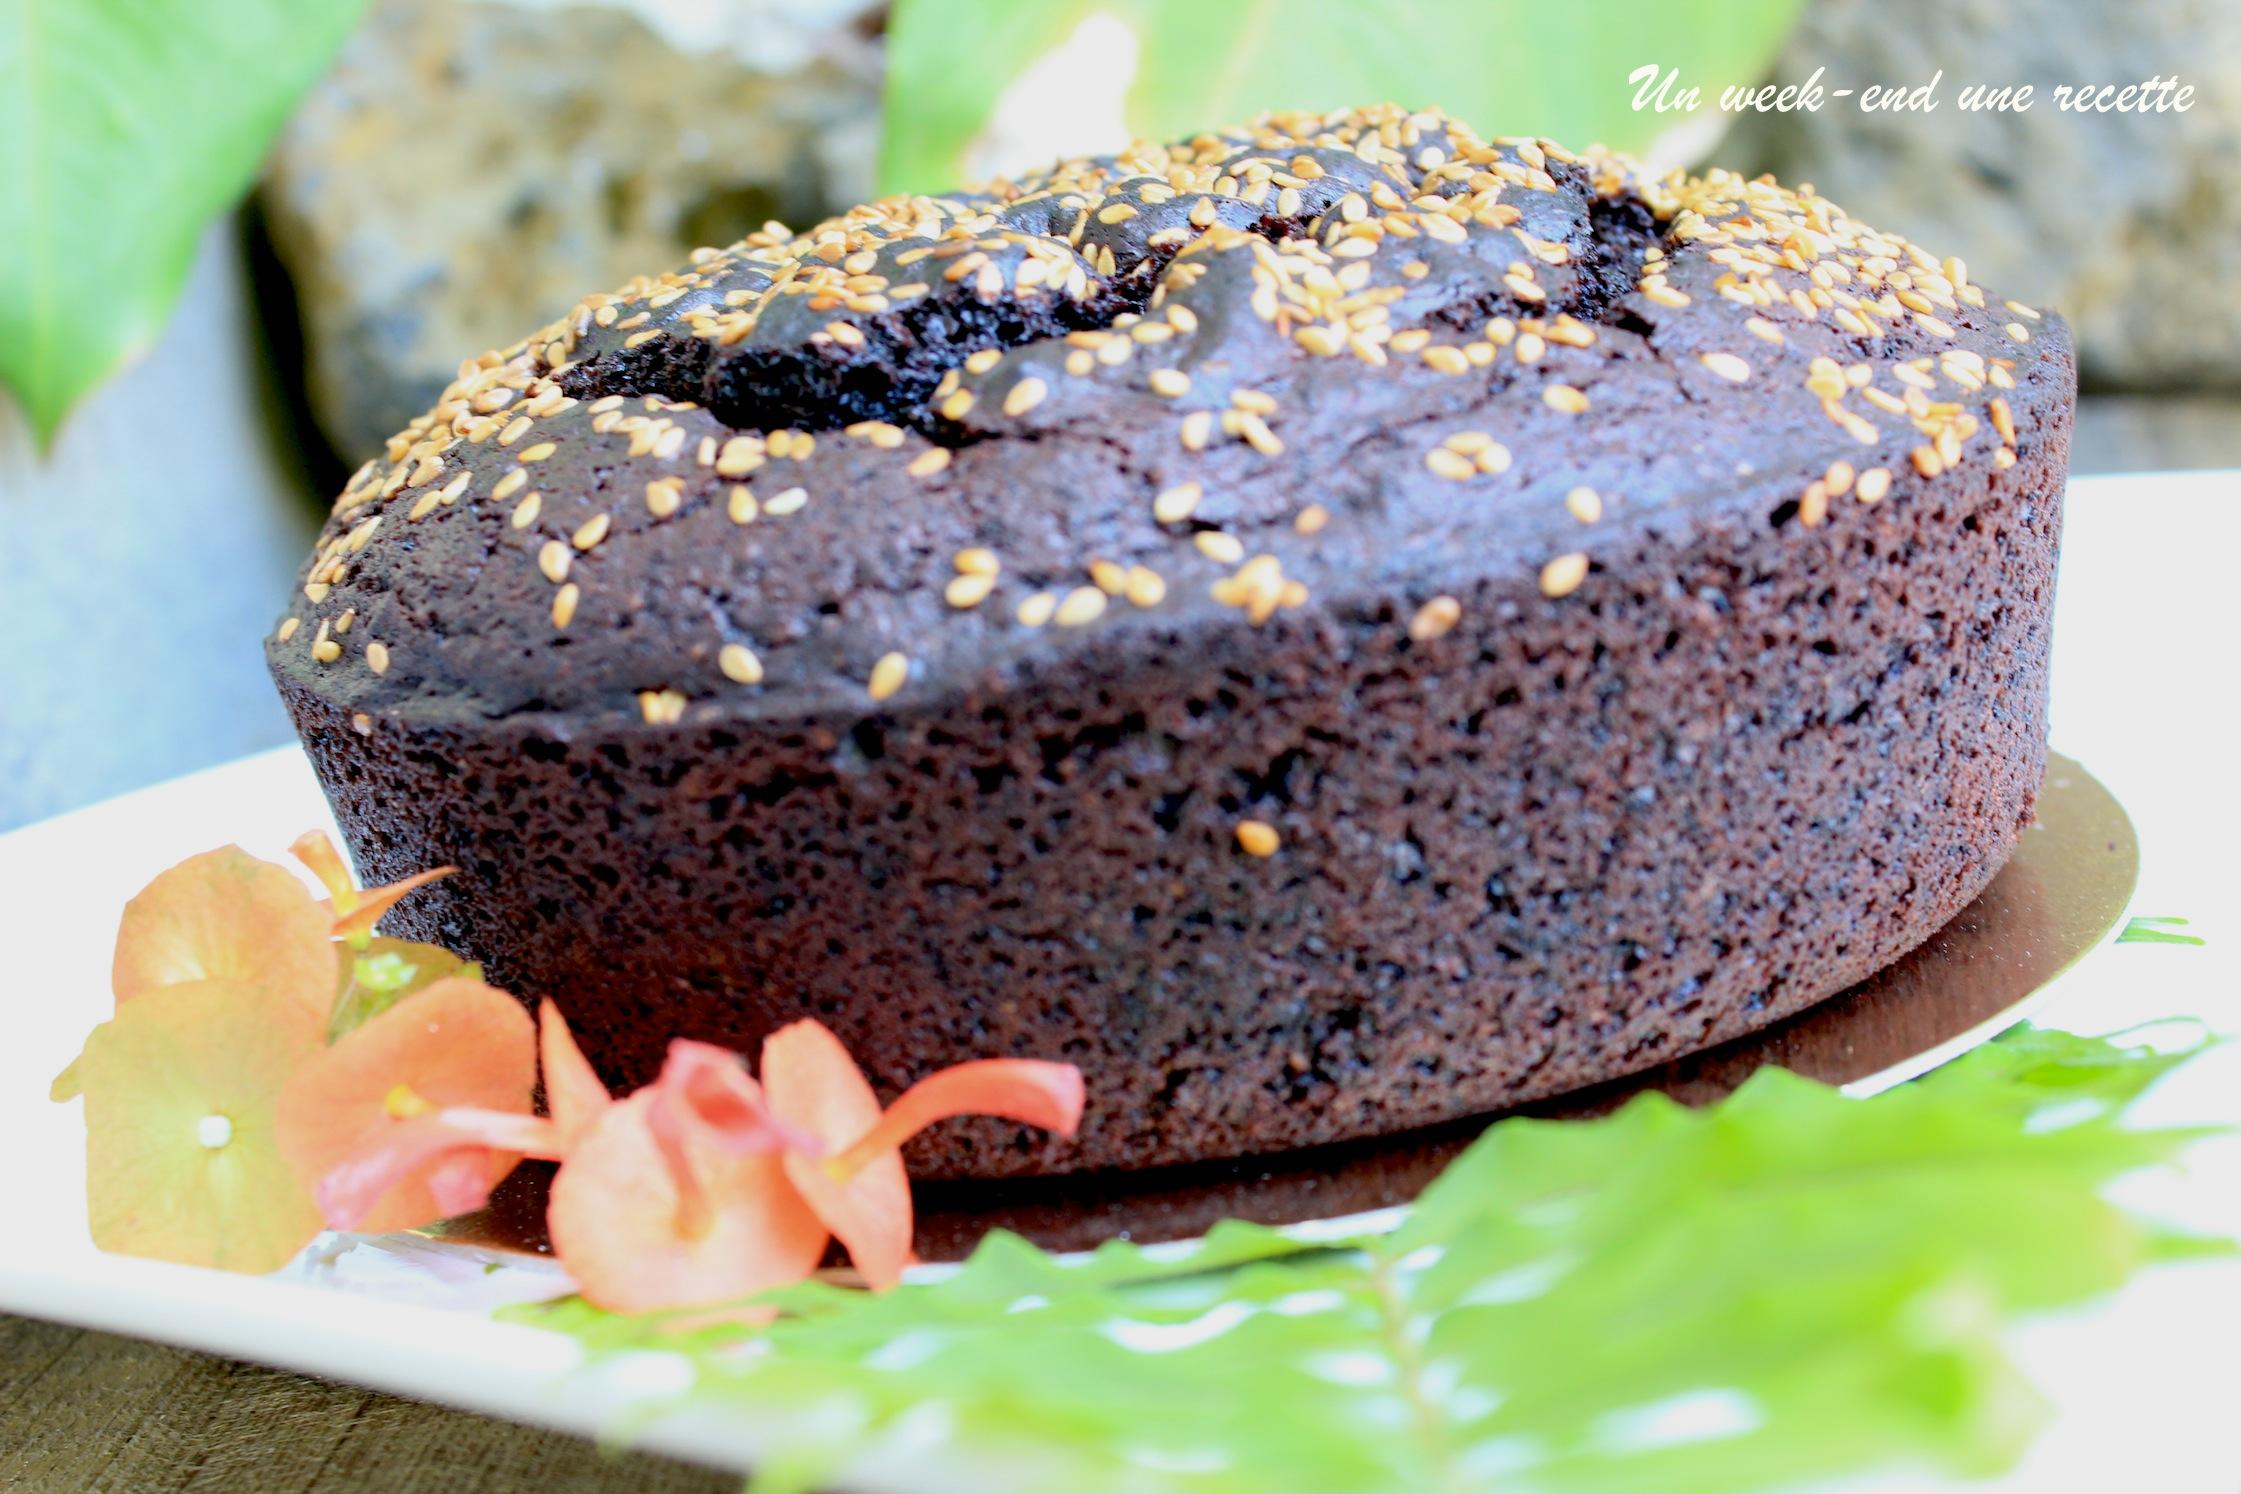 Gâteau au chocolat cacahuètes sésame